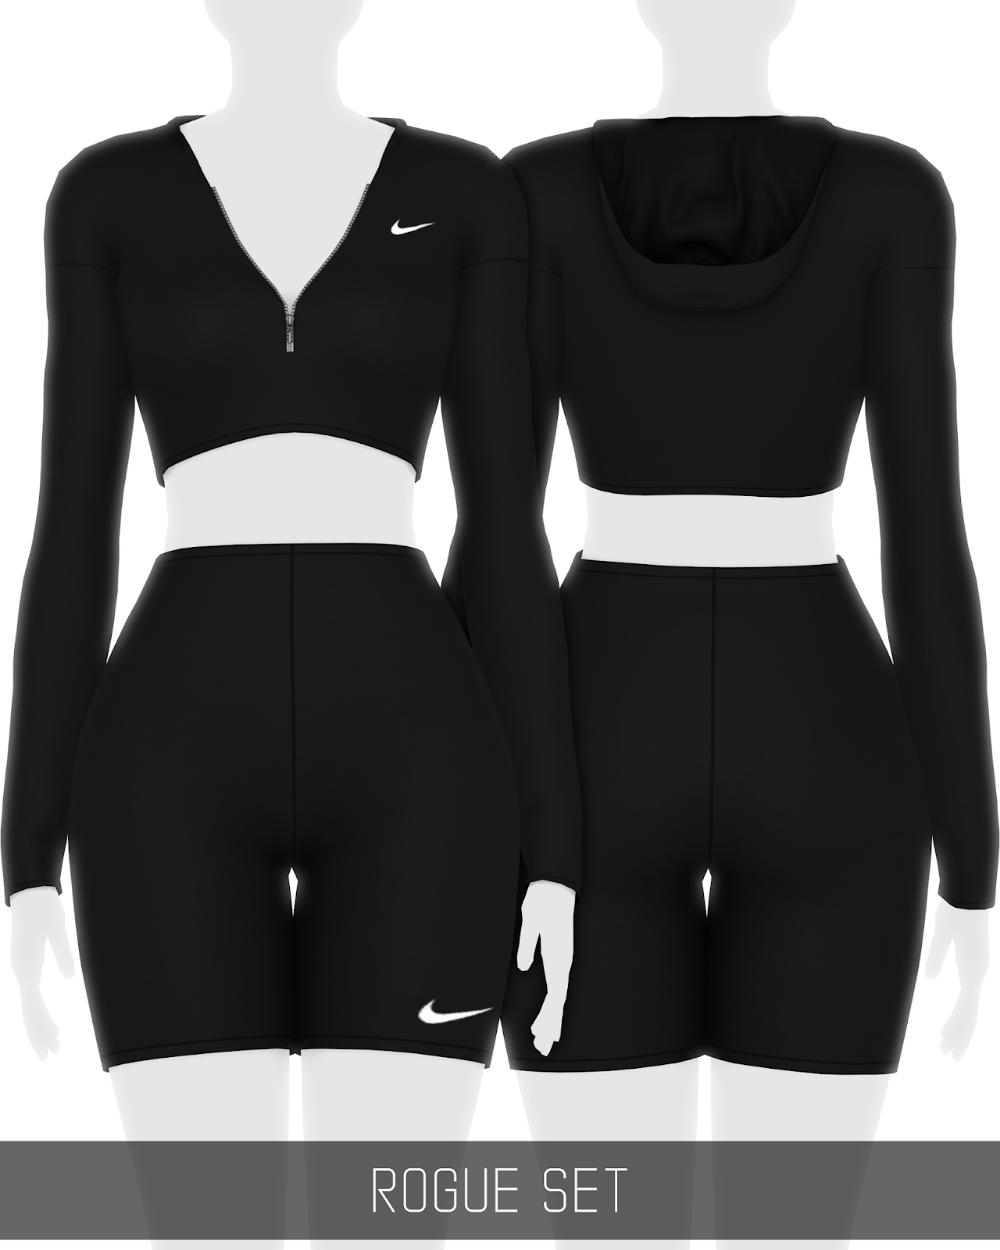 Mod Sims 4 Ado Enceinte : enceinte, RogueSet, Dresses,, Clothes,